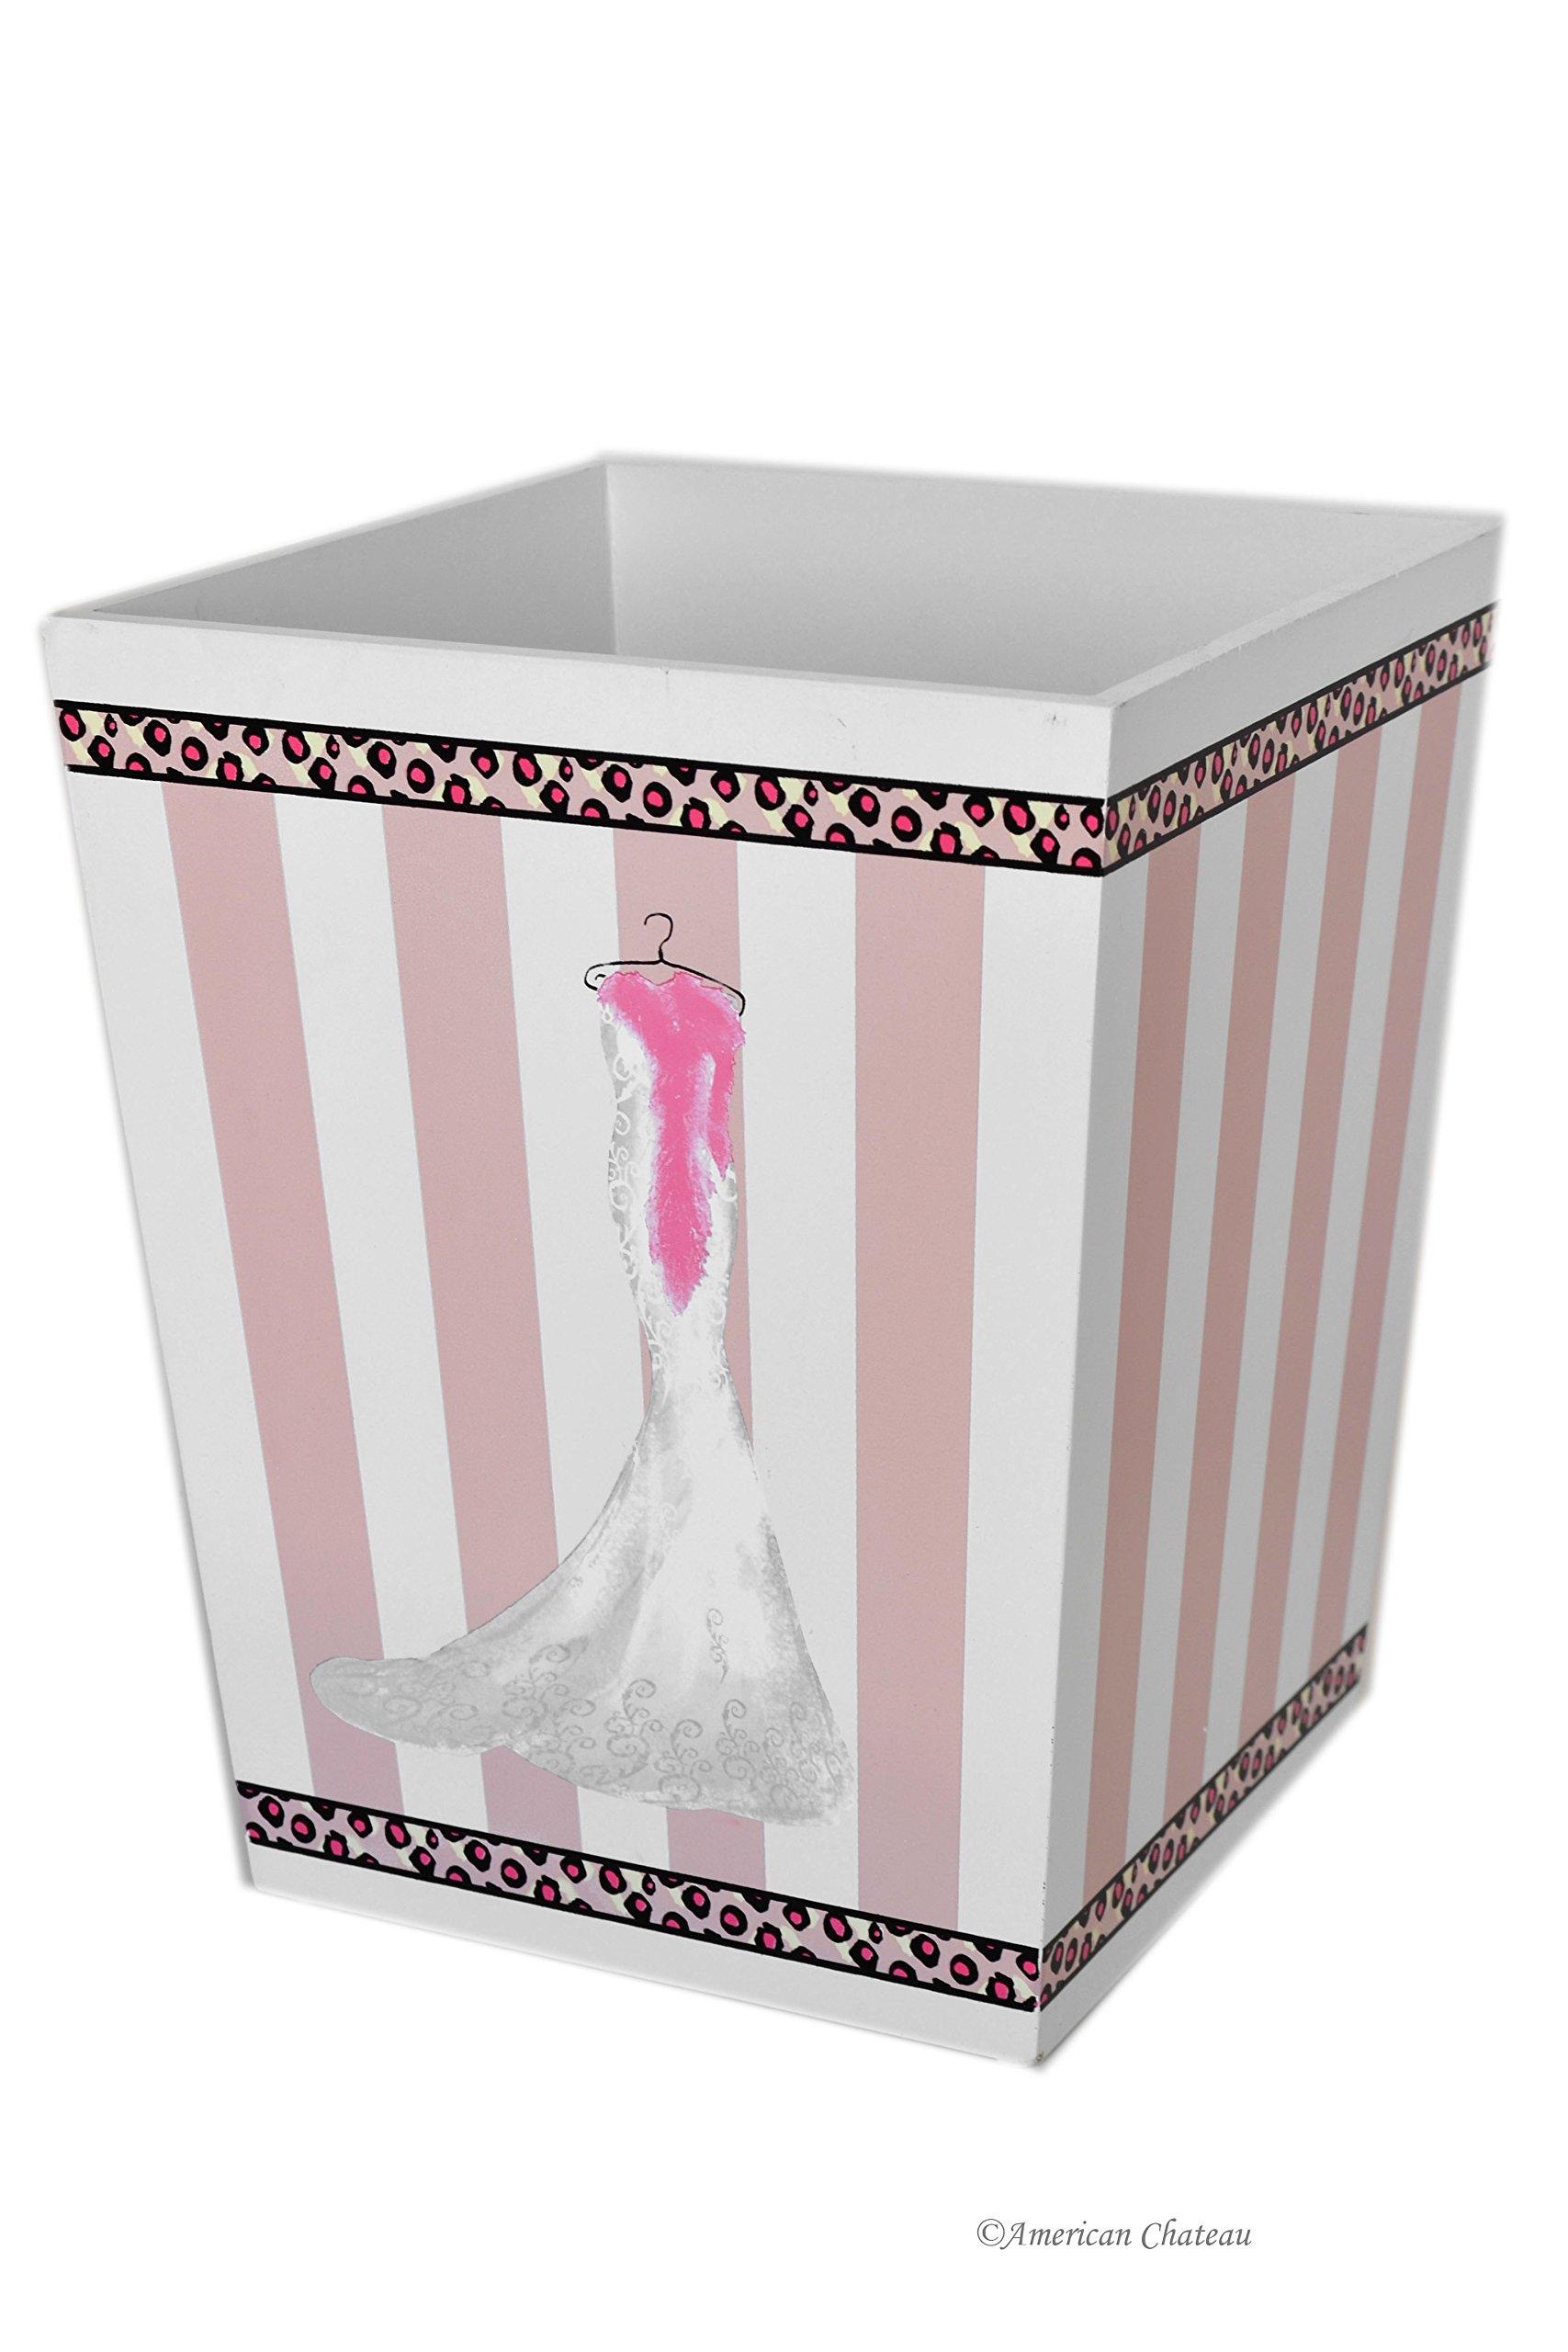 American Chateau Large Wood 9.75'' Glam Dress-Shop Pink & White Waste Basket Trash Garbage Can